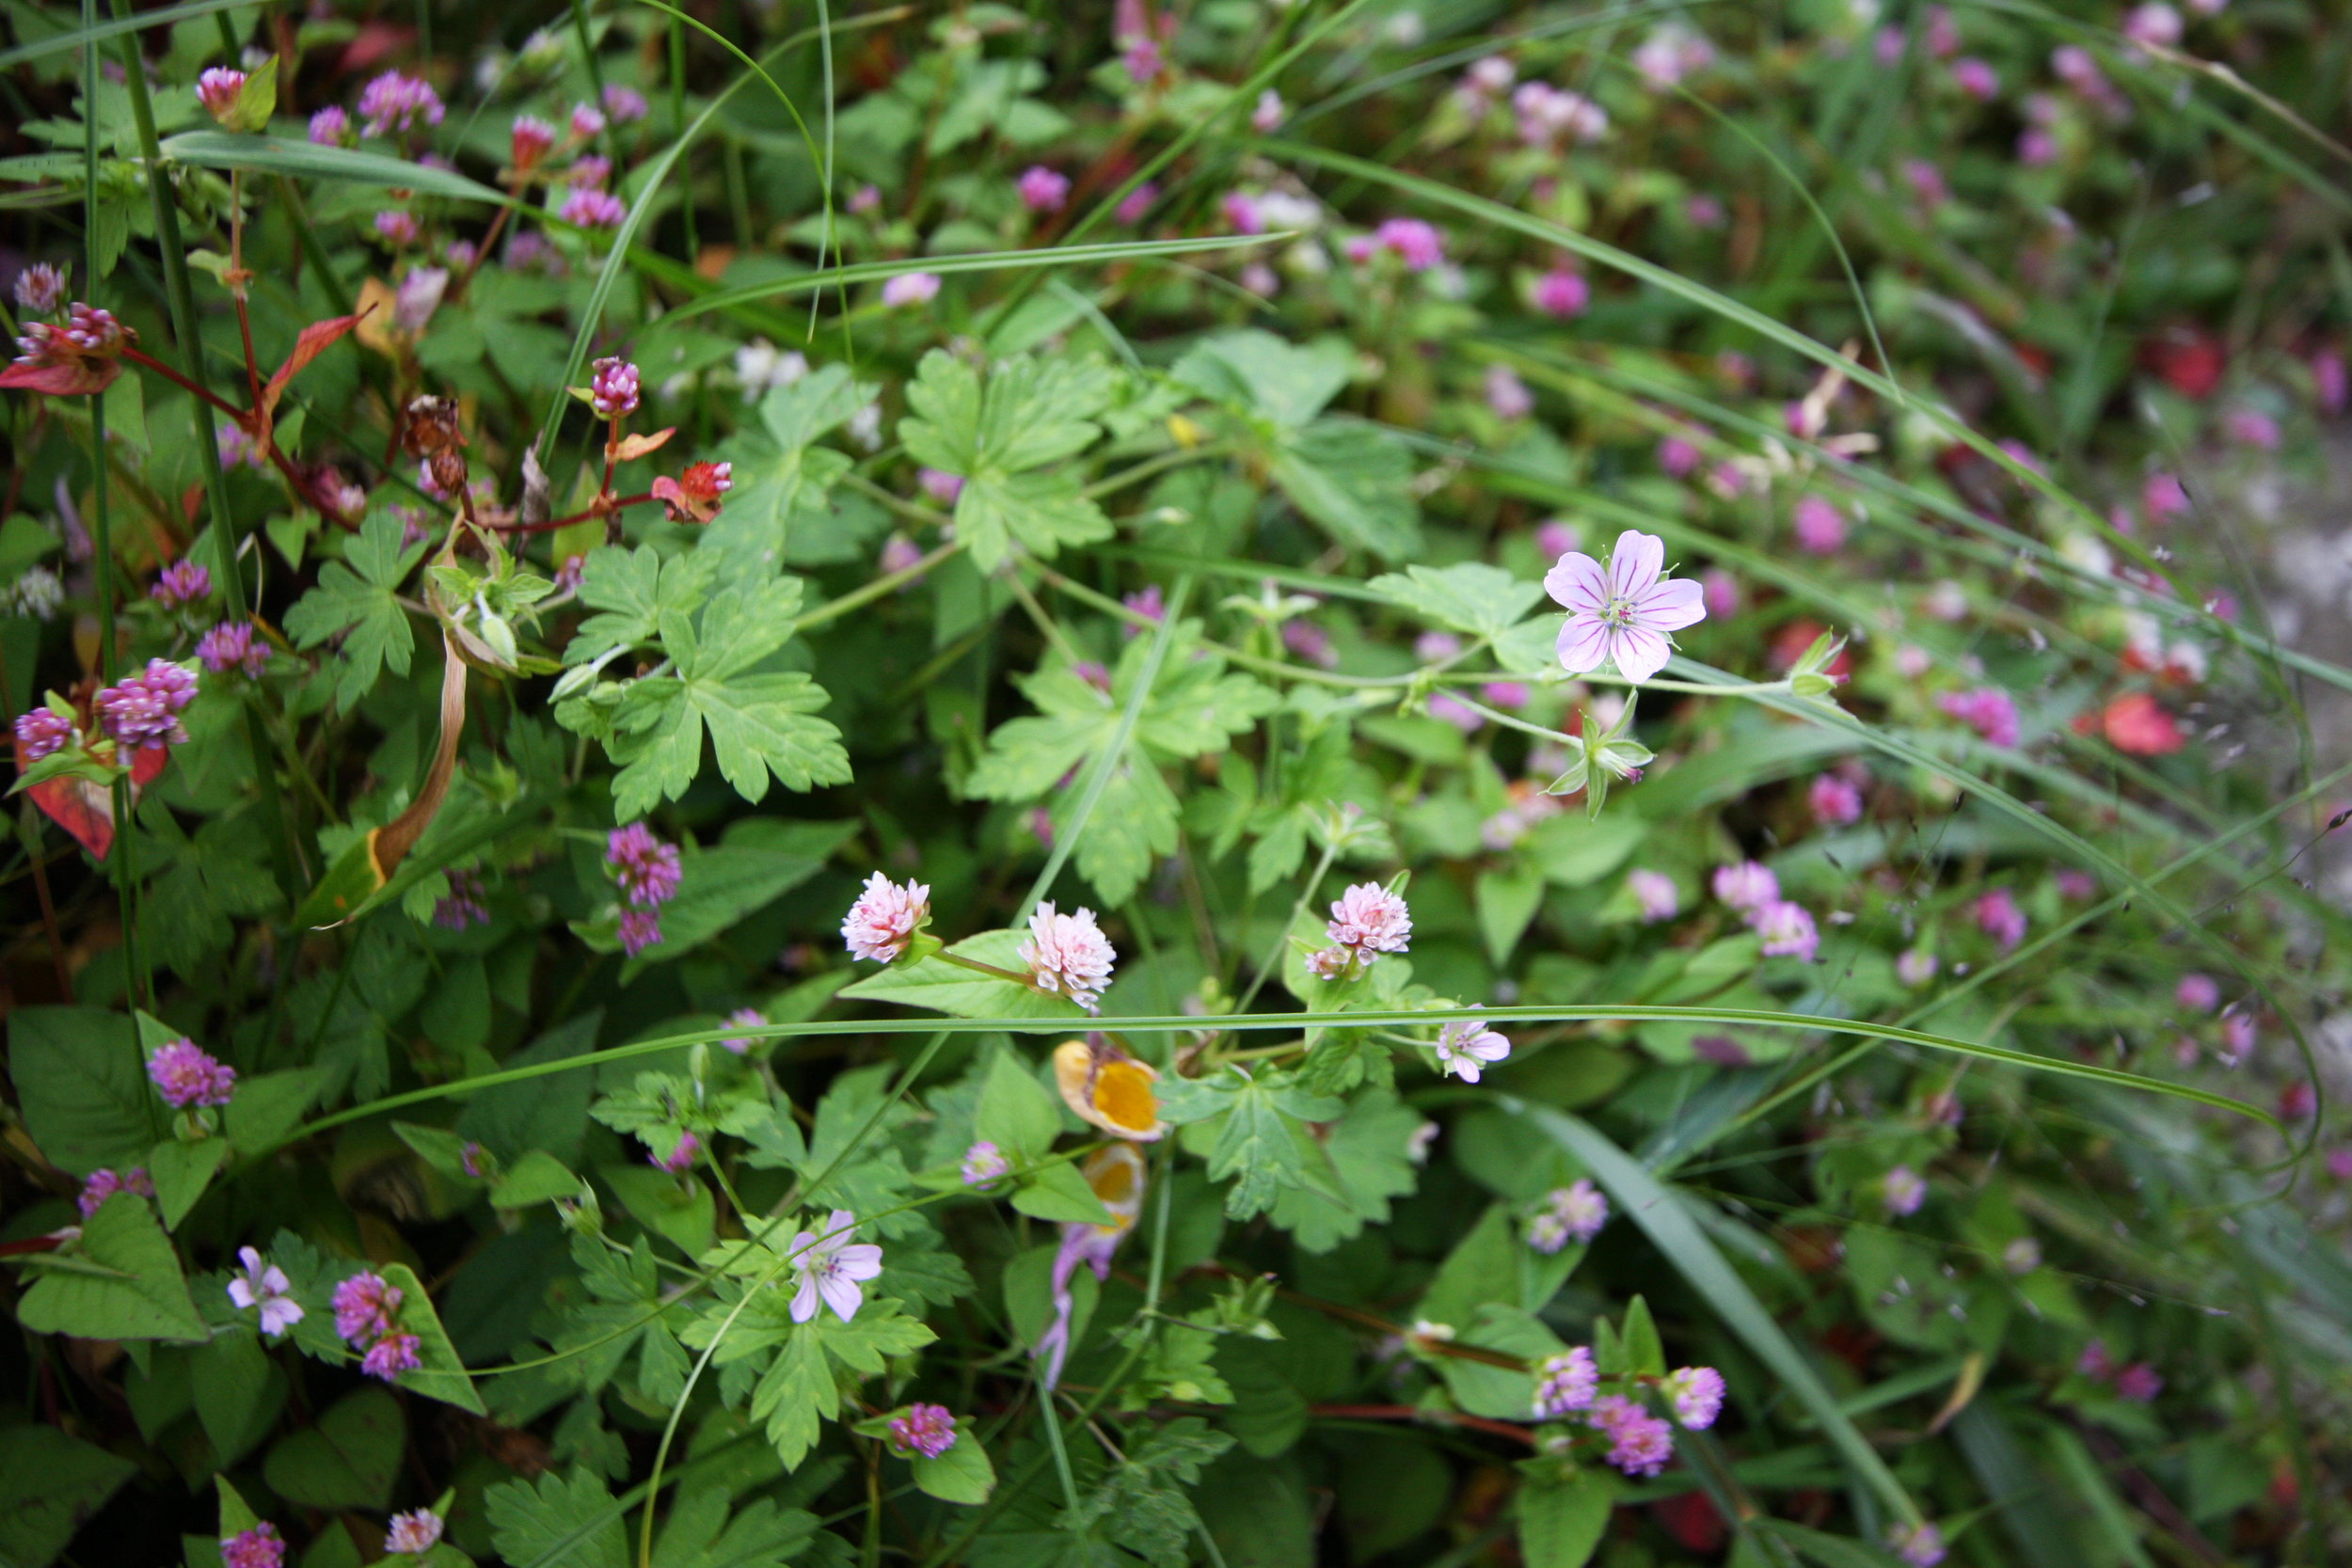 Persicaria alata (Buch.-Ham. ex spreng, Geranium wallachainum D.Don ex Sweet